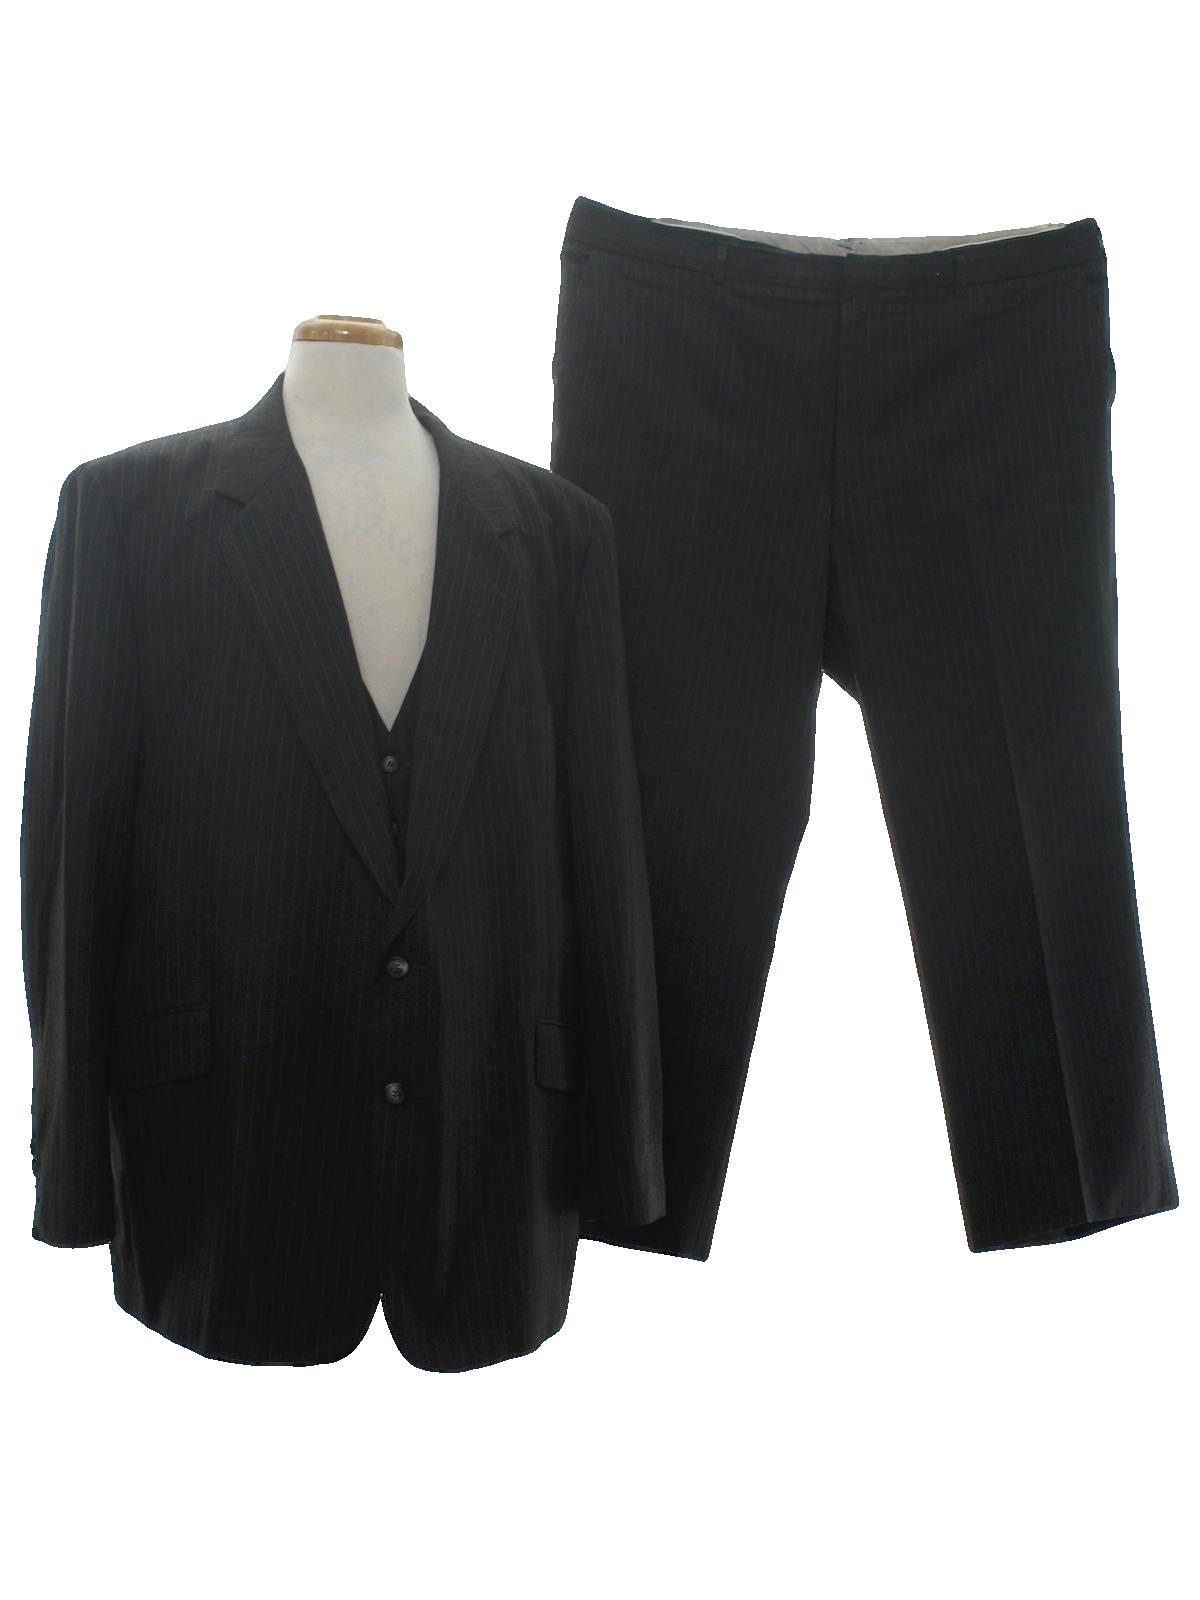 Retro Eighties Suit 80s Label Missing Mens Charcoal